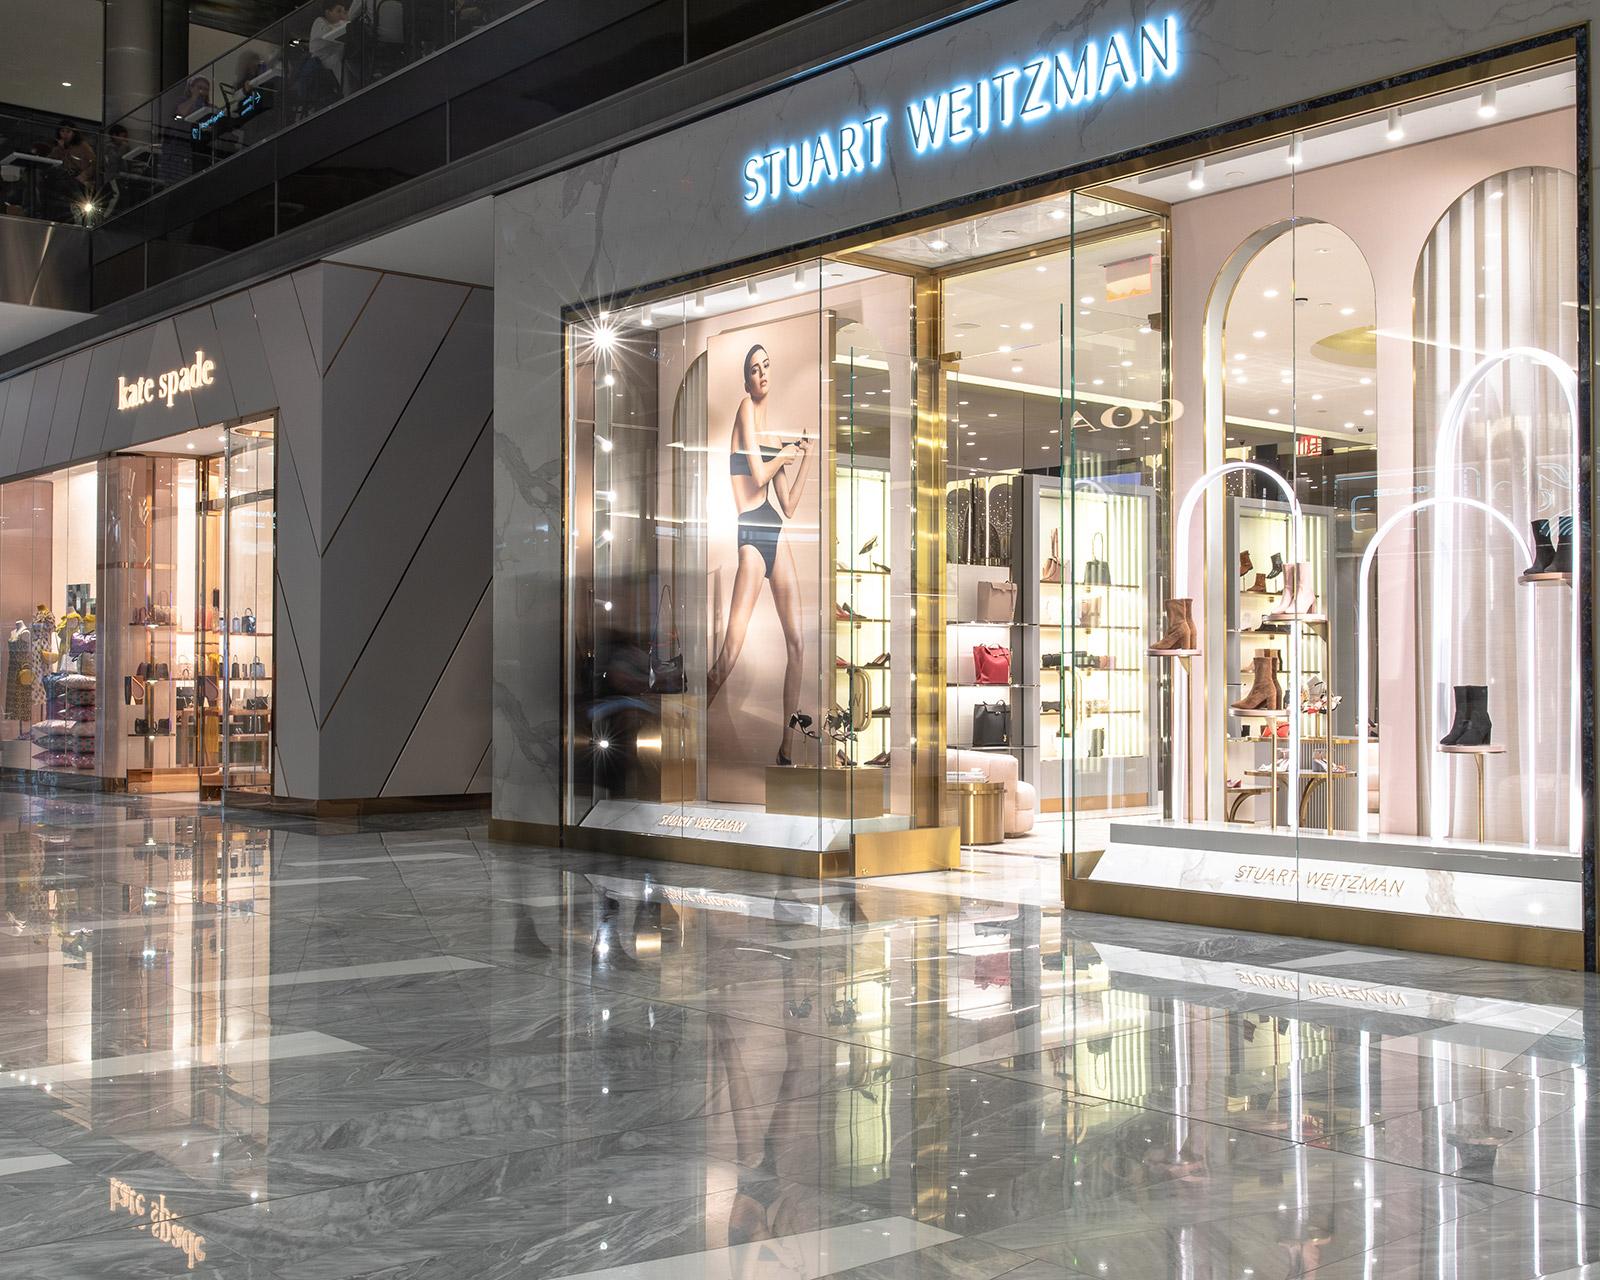 Stuart Weitzman store exterior